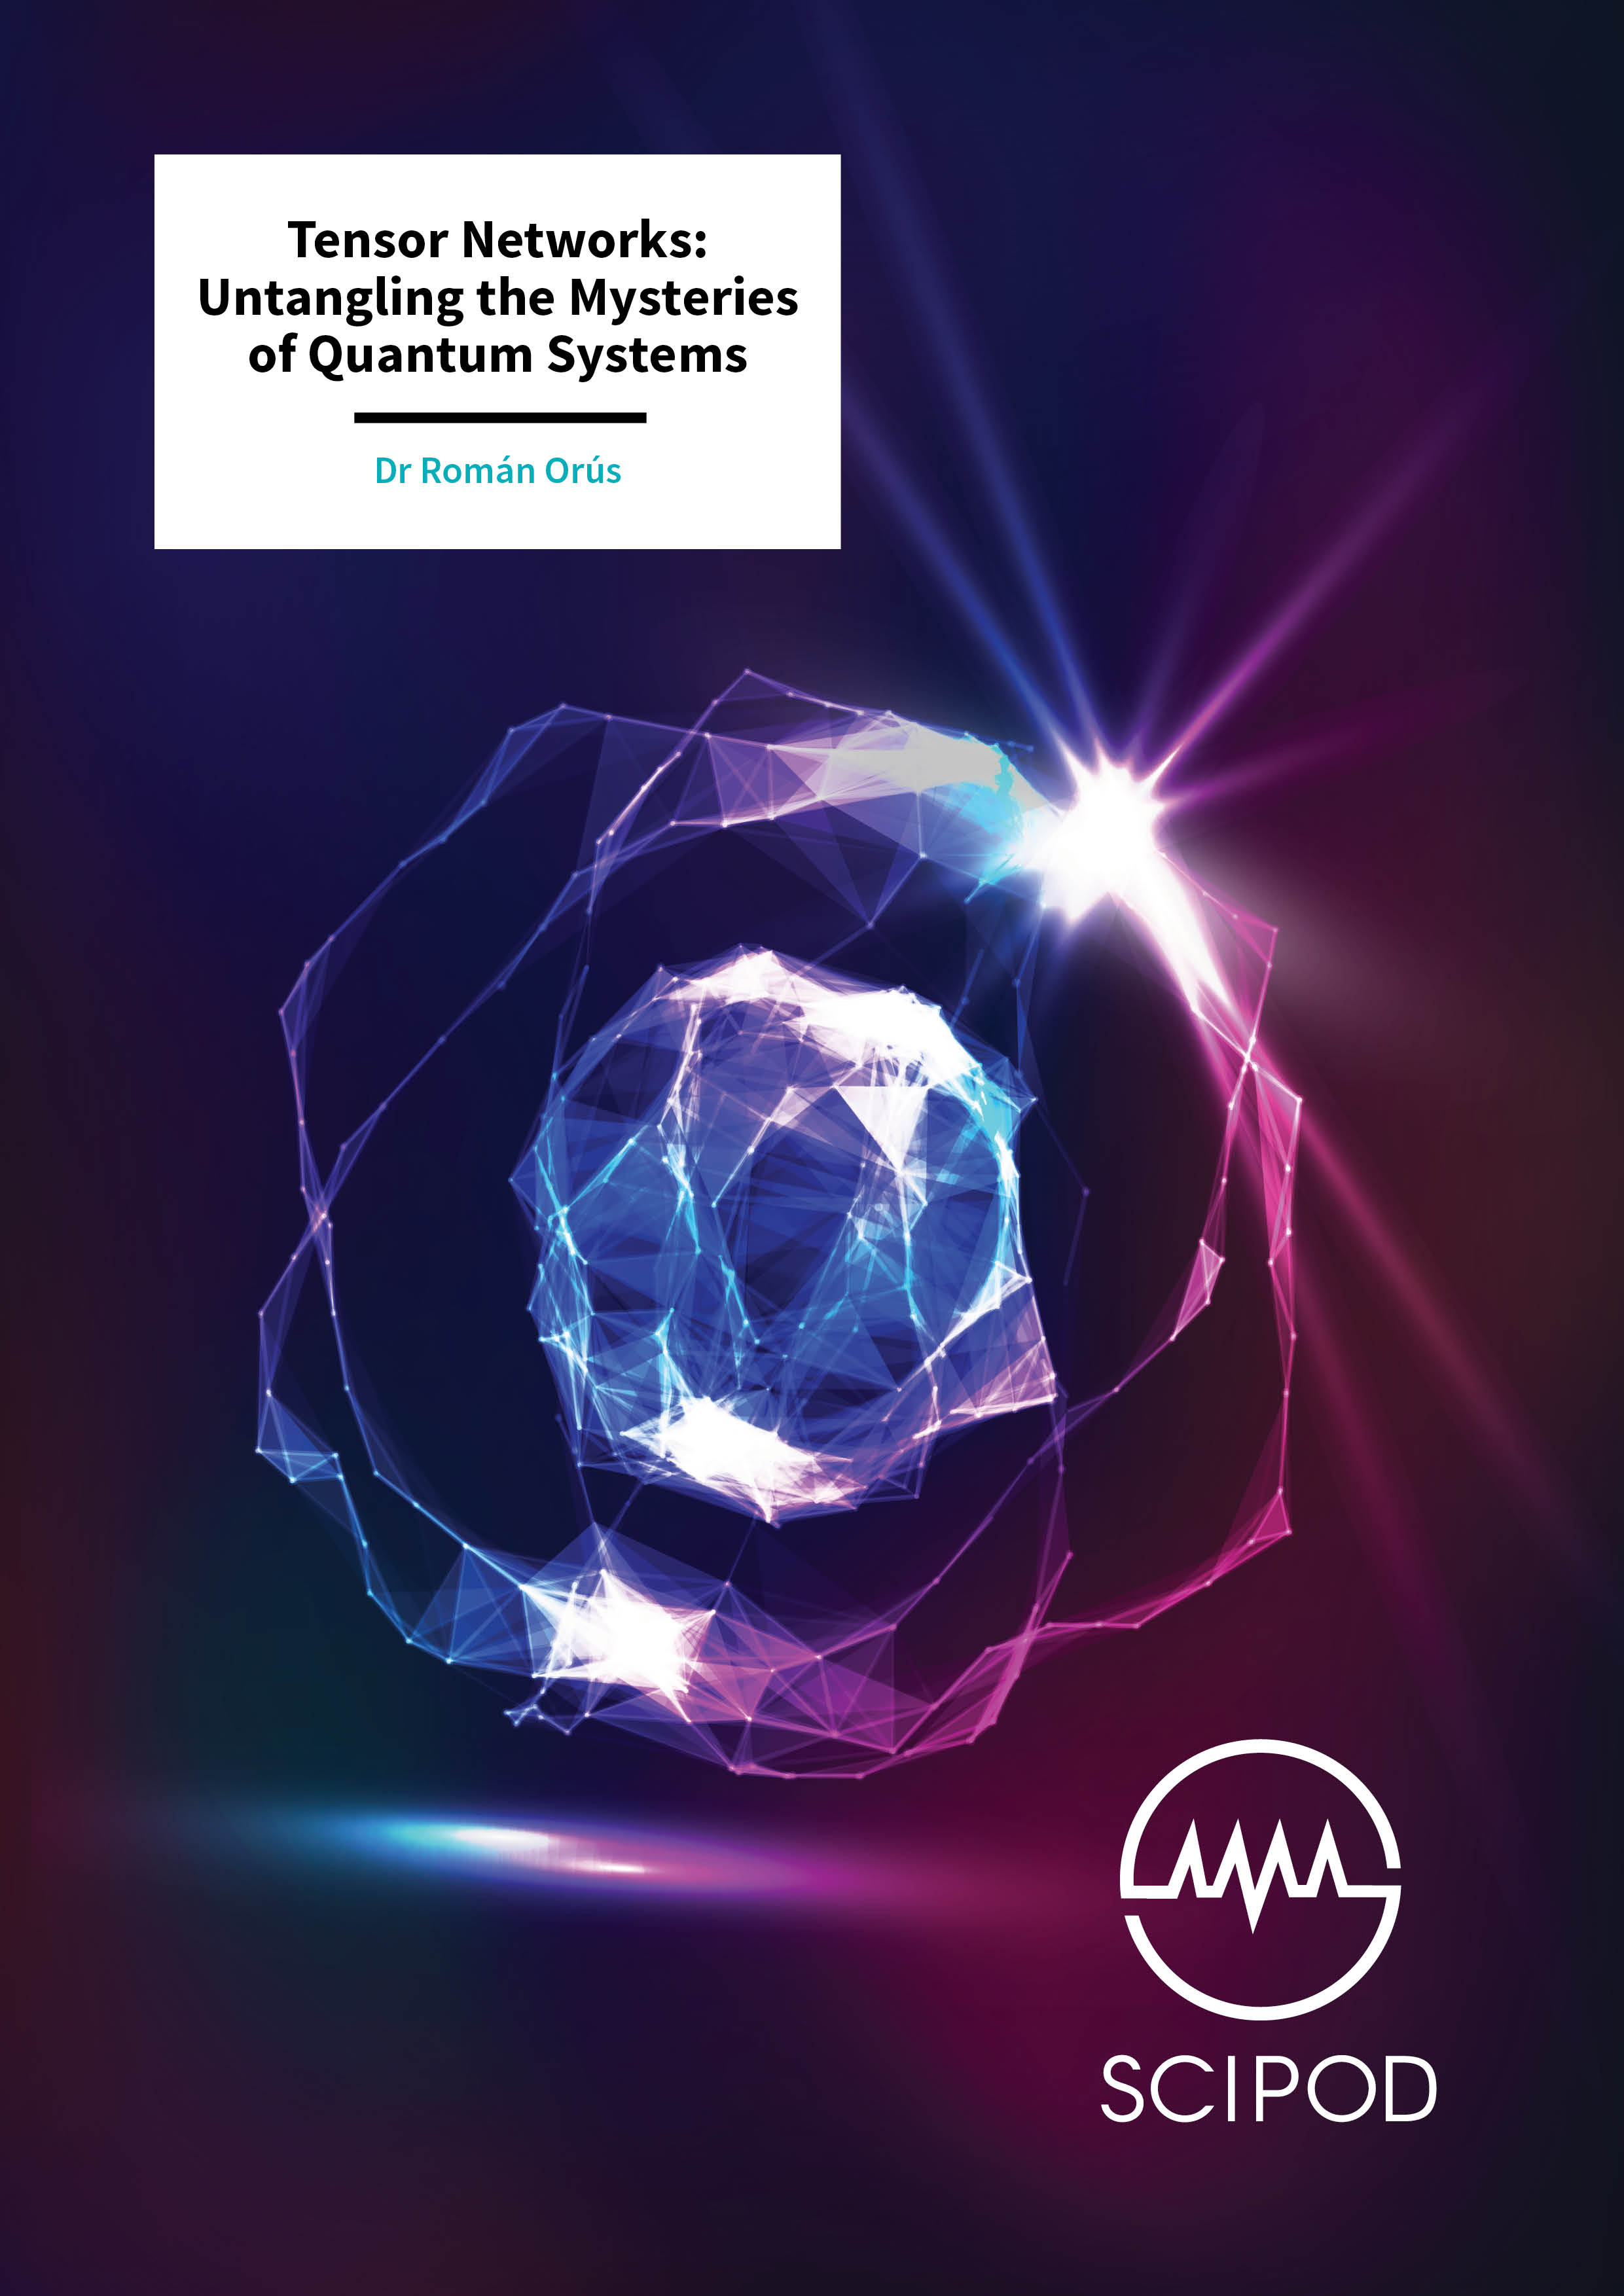 Tensor Networks Untangling the Mysteries of Quantum Systems – Dr Román Orús, Johannes Guttenberg Universität